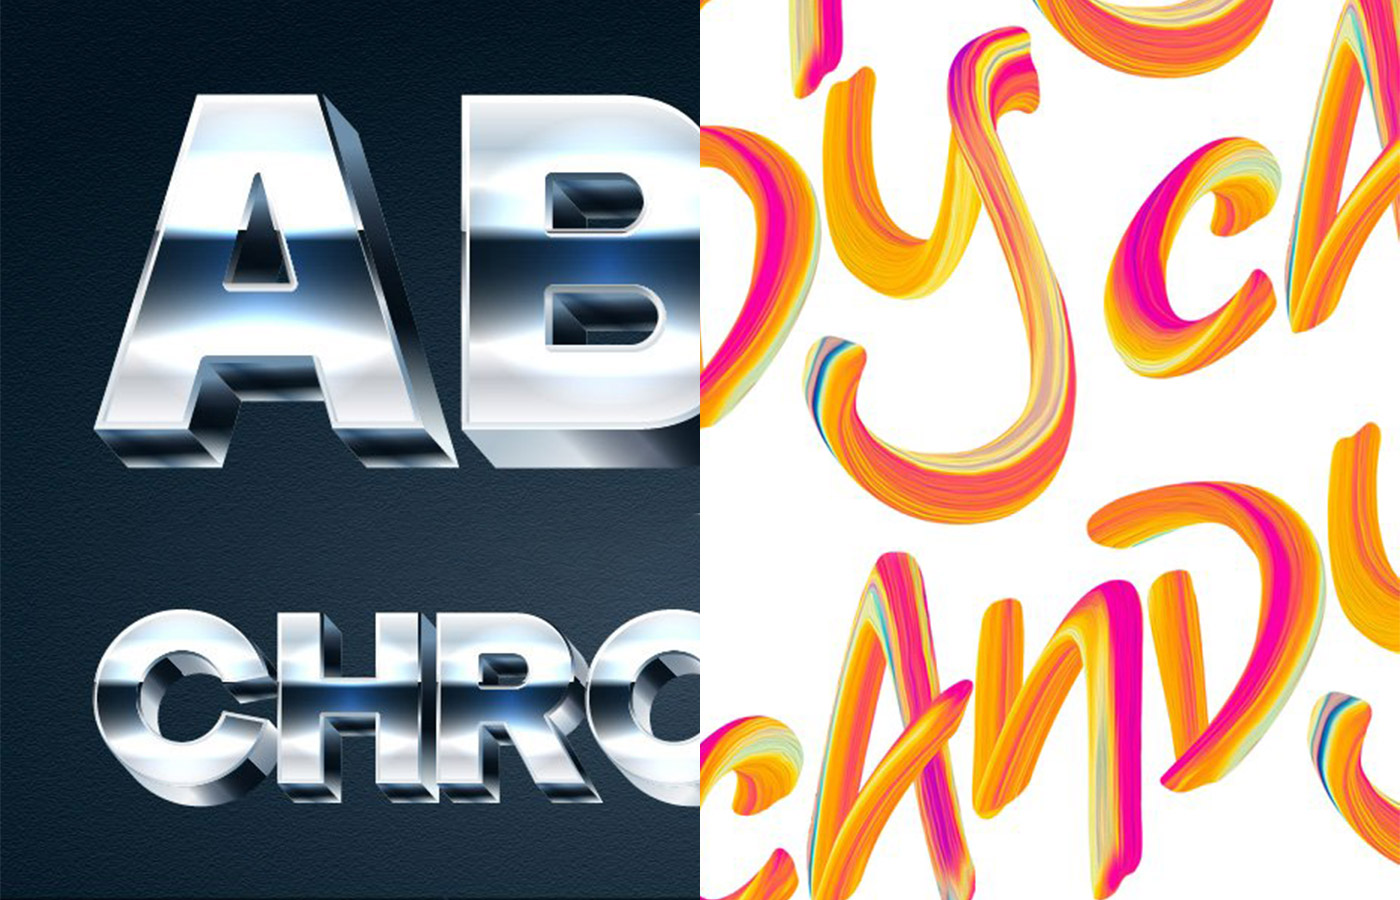 Silver Chrome (popskraft) / Candy Script (Twinbrush Image Forge)